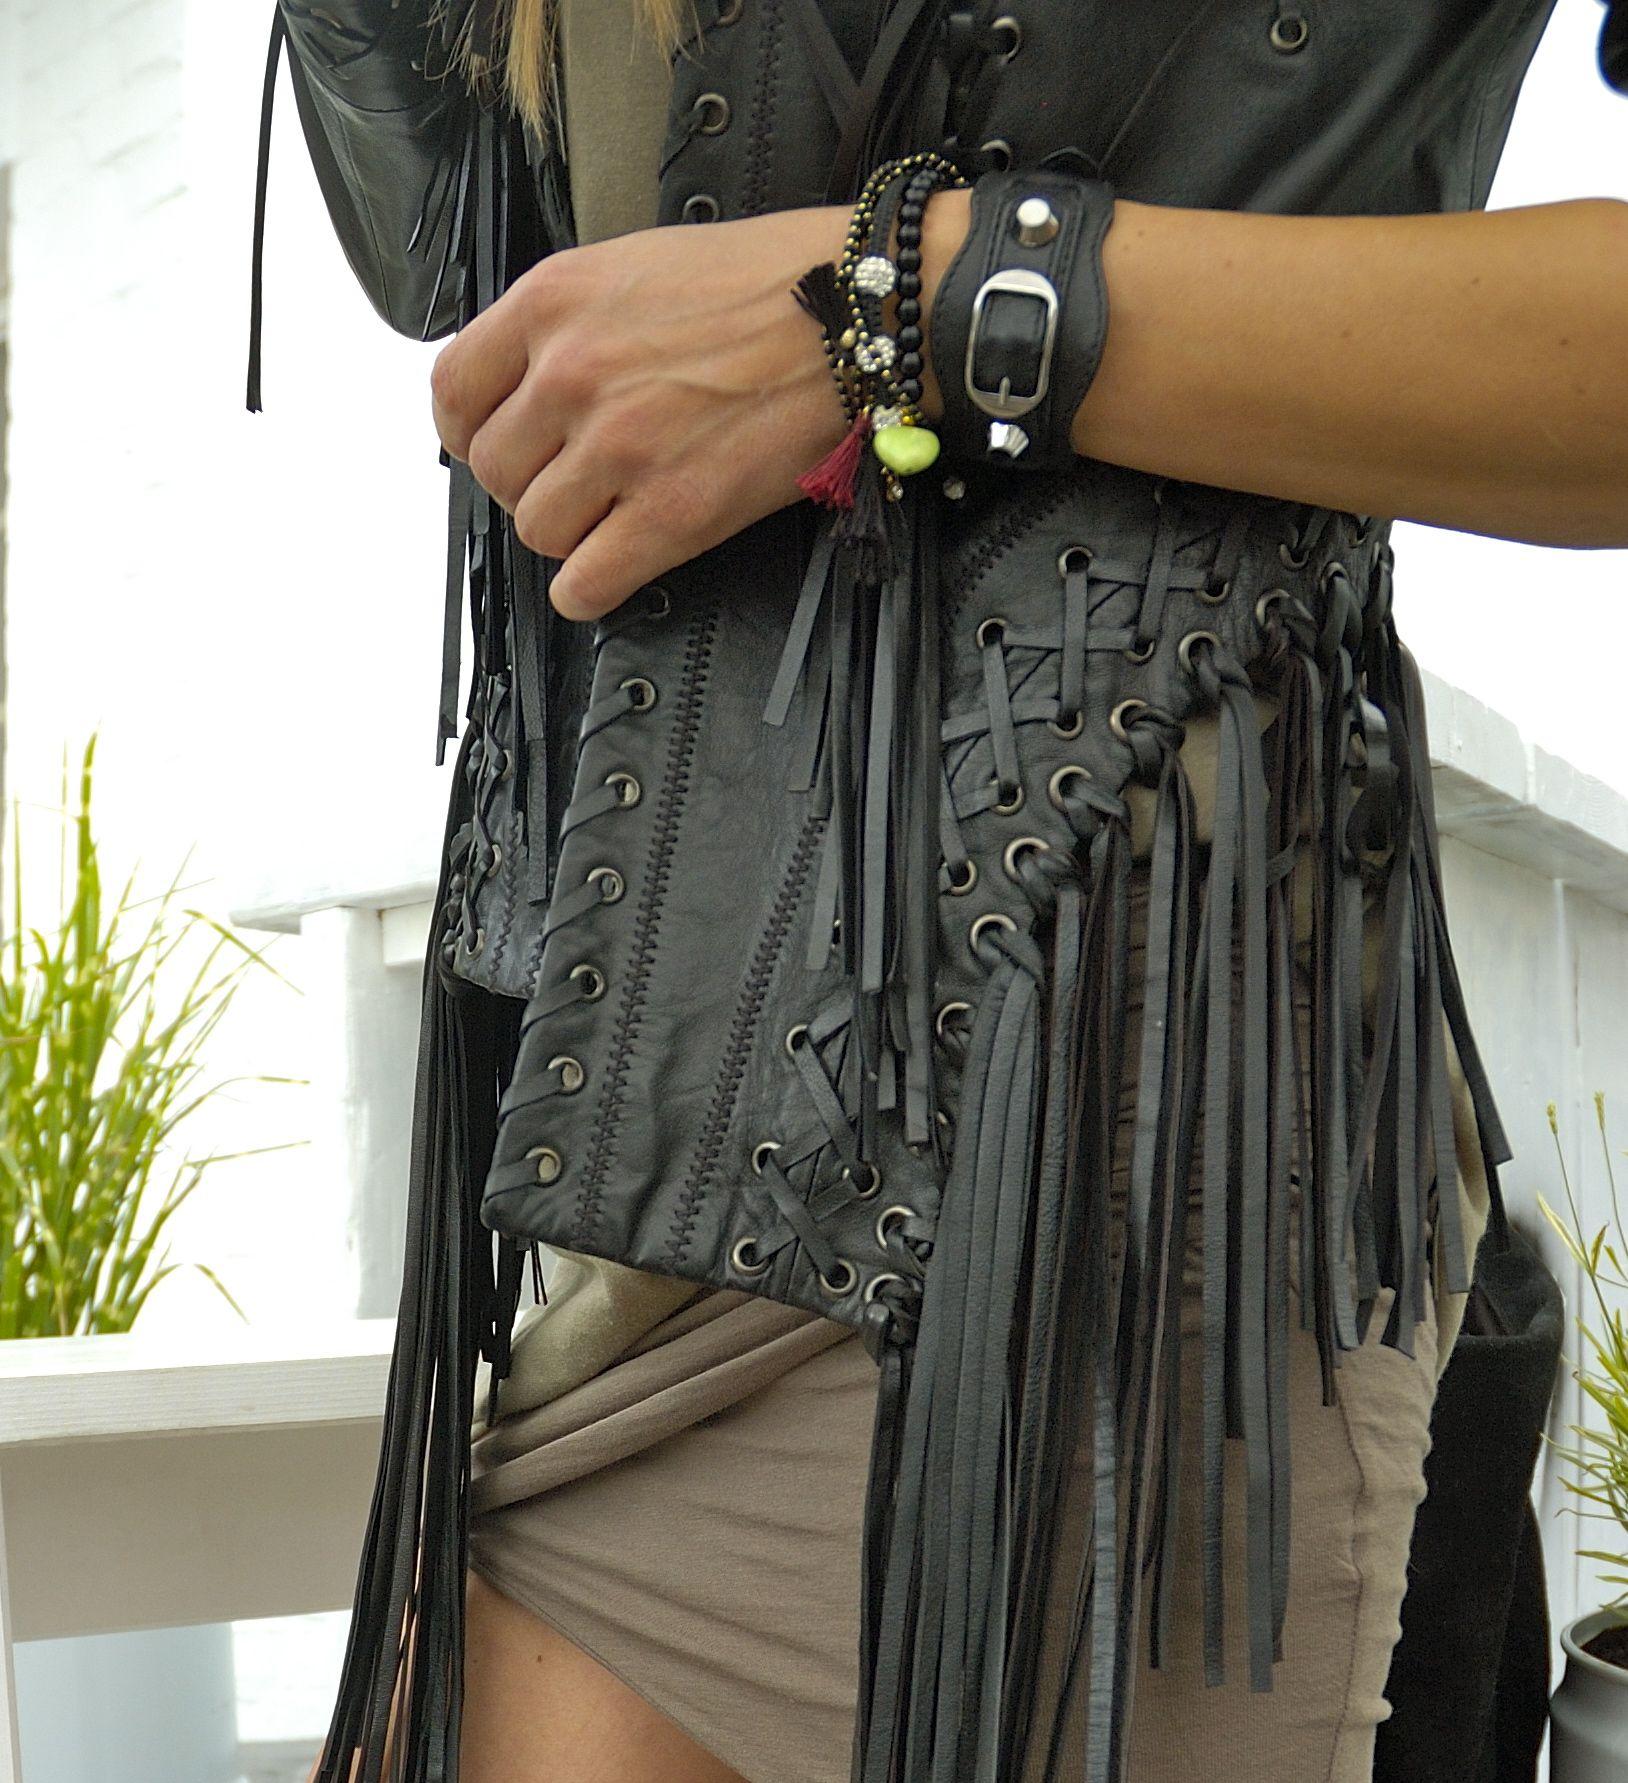 Roberto Cavalli leather jacket / James Perse skirt  see now on www.blondwalk.com